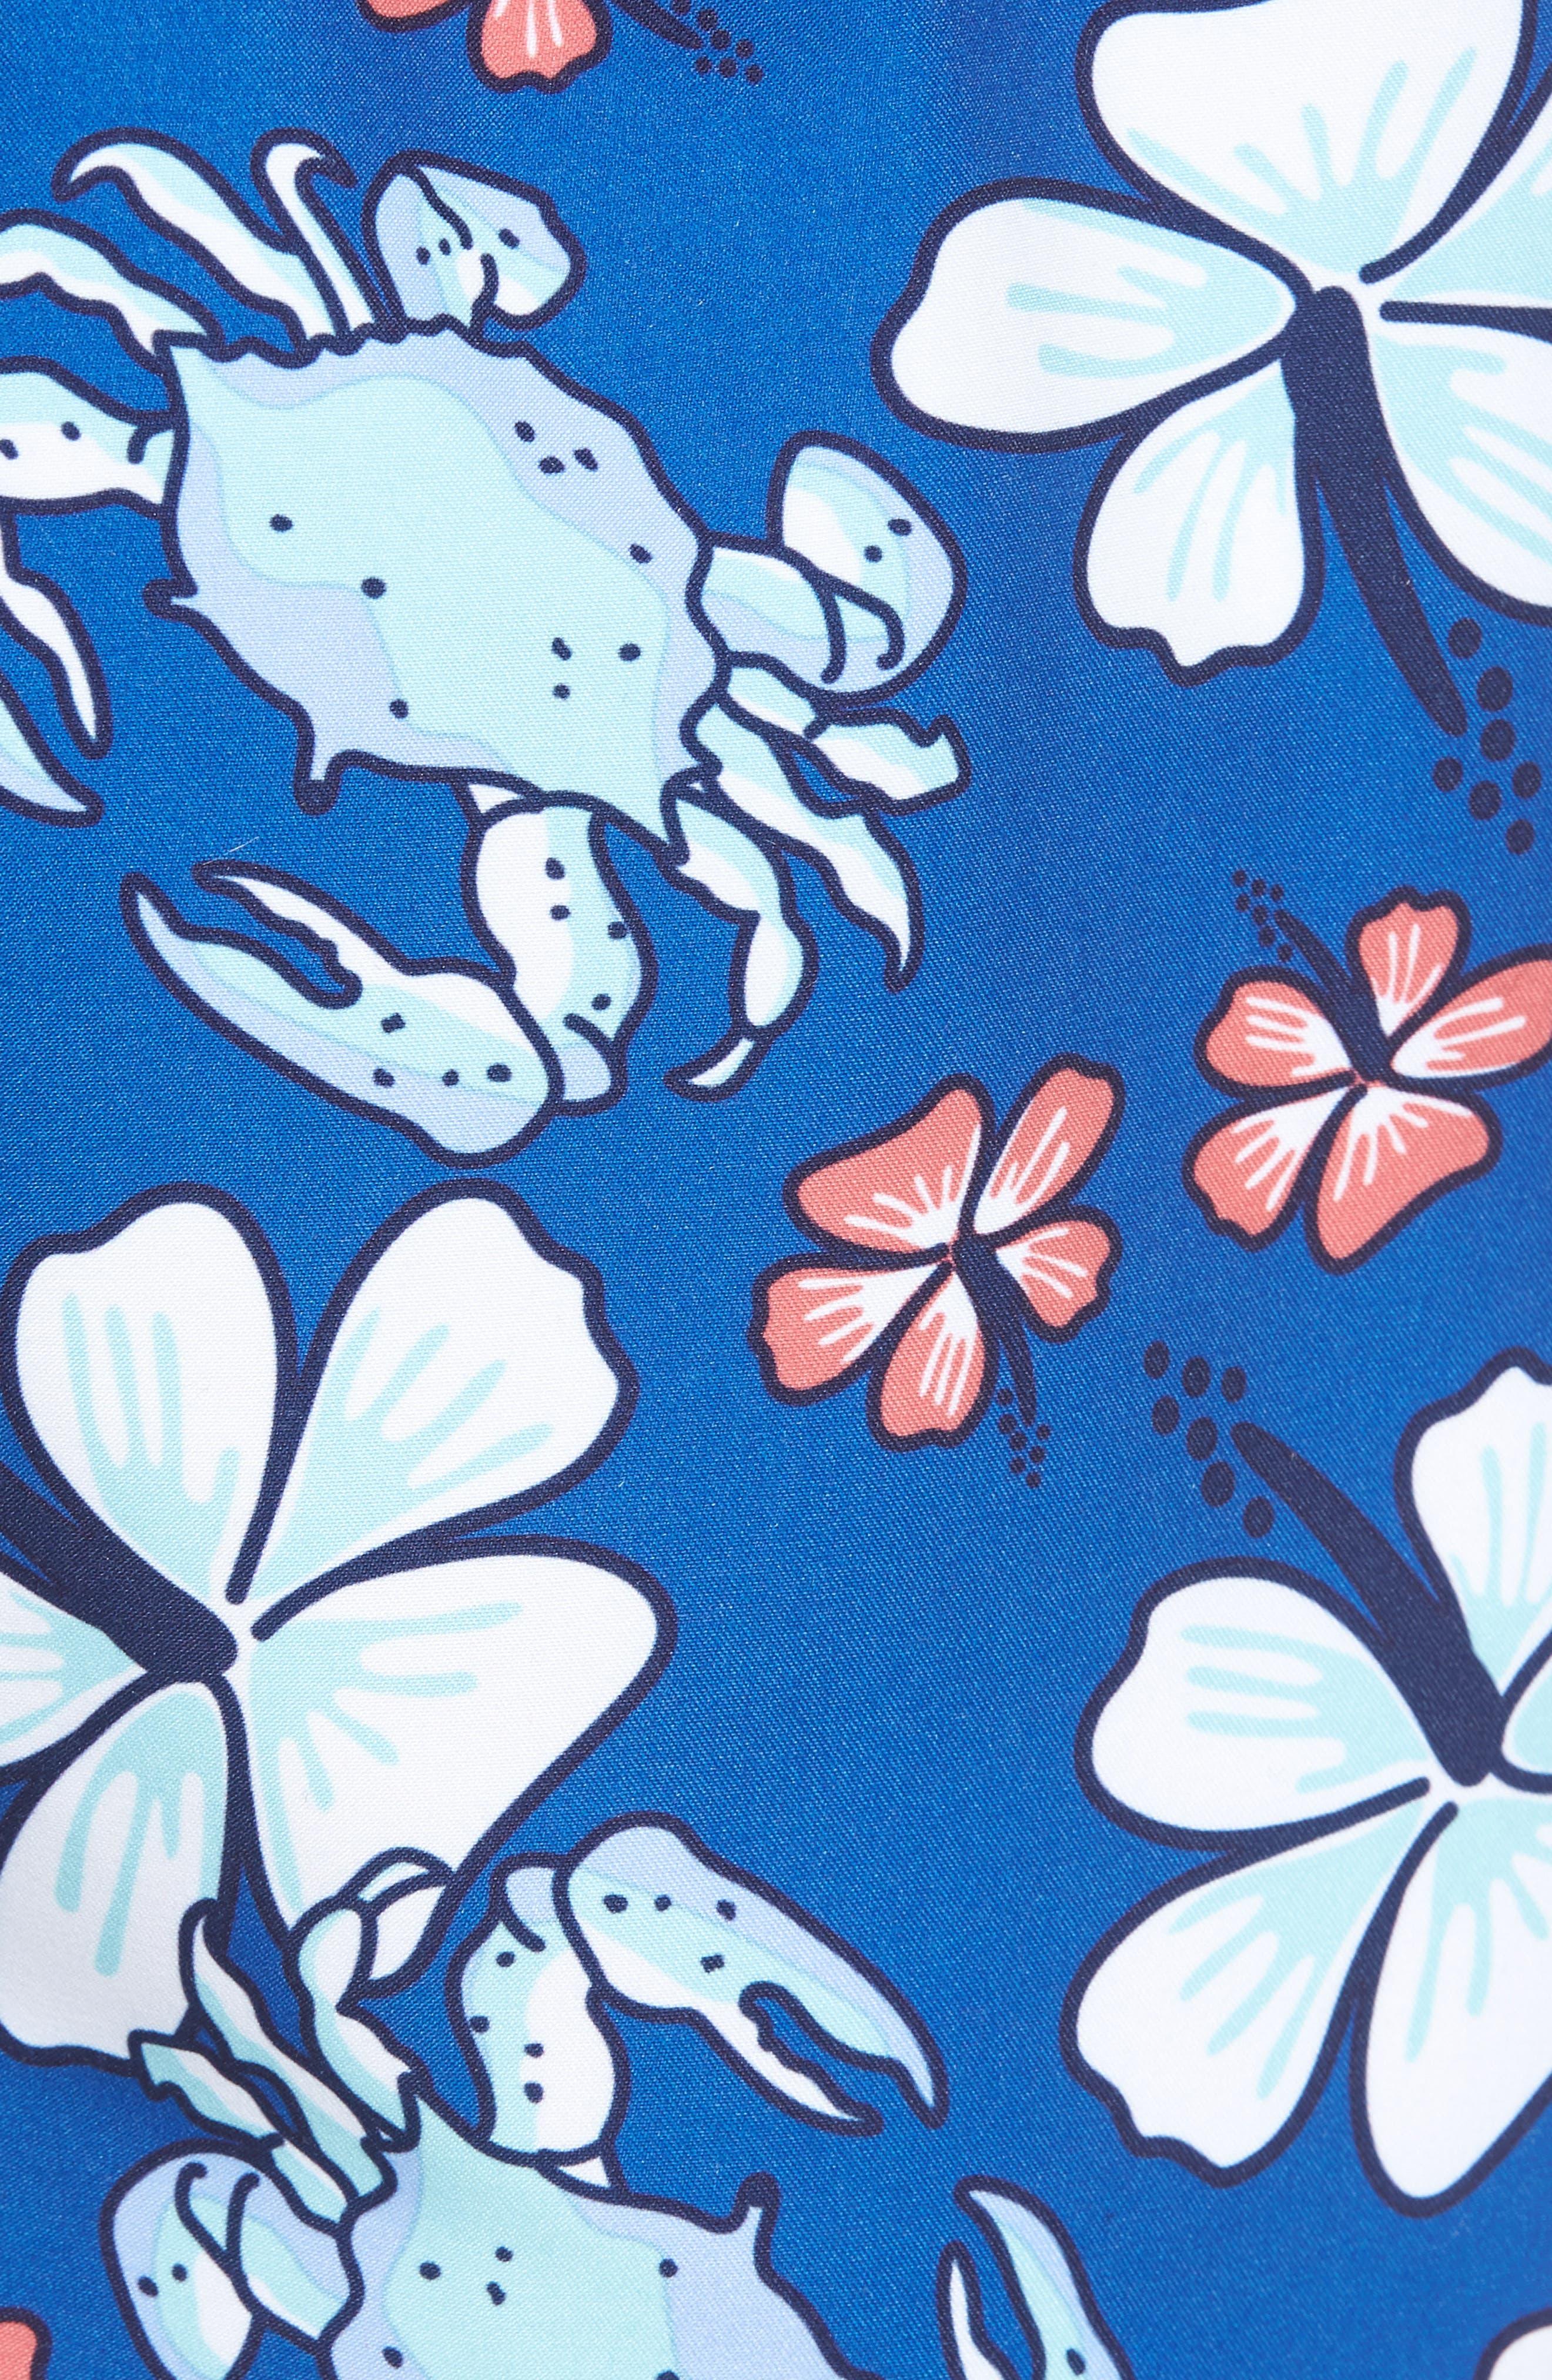 Chappy Crab Floral Swim Trunks,                             Alternate thumbnail 5, color,                             Yacht Blue